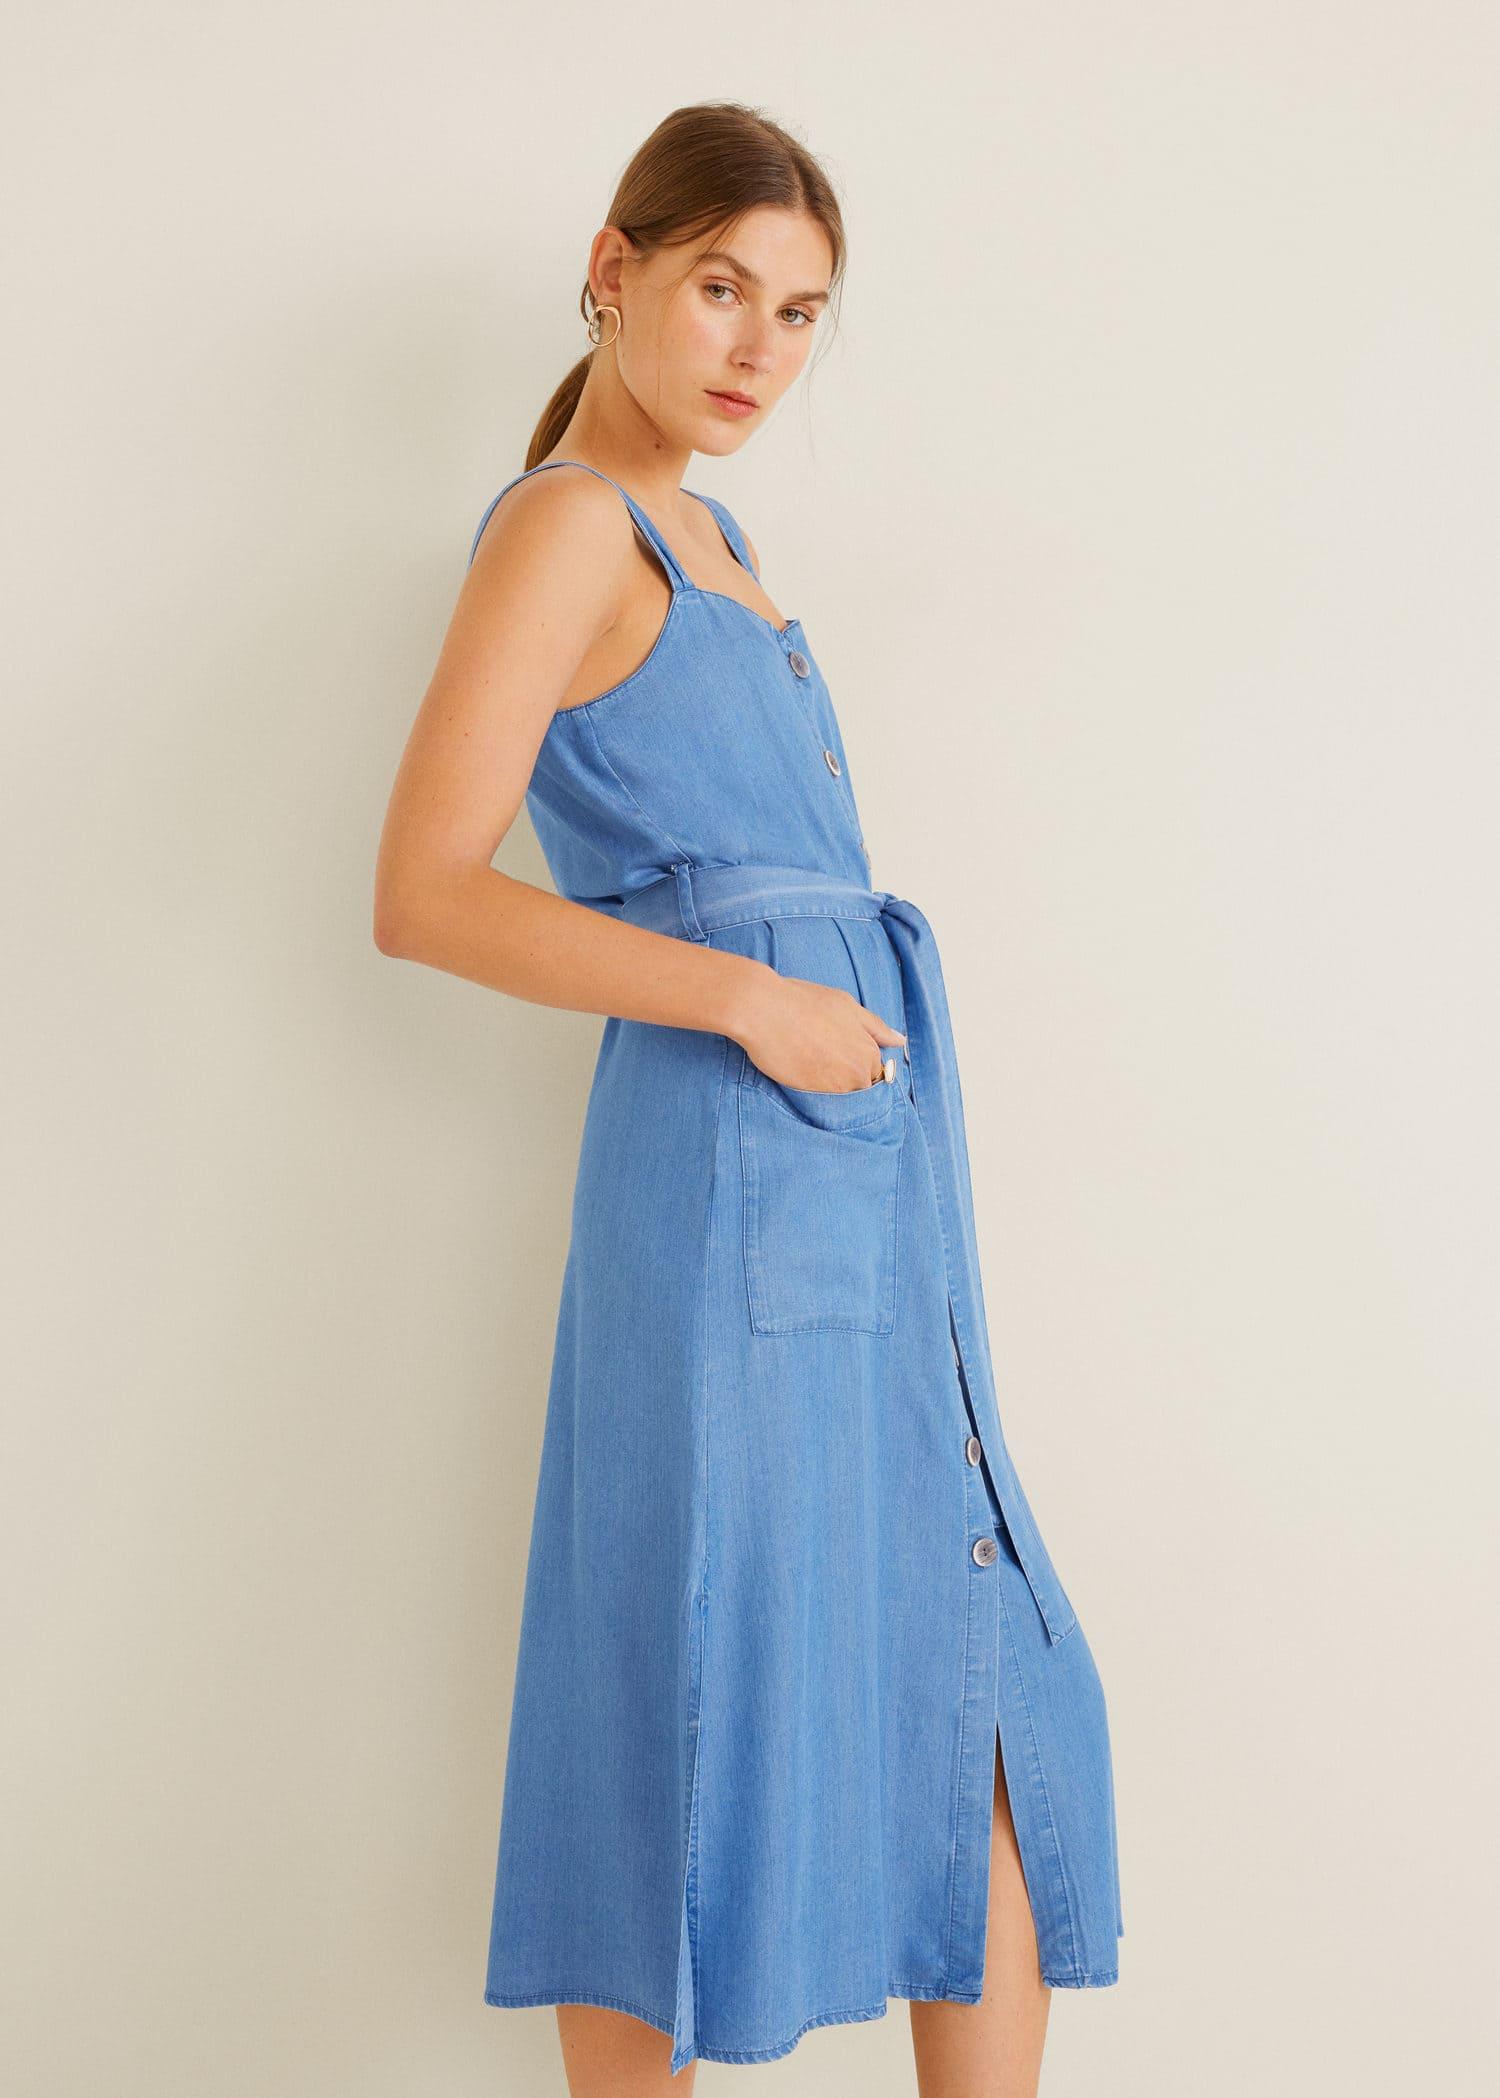 Denim style soft dress Woman | MNG Australia